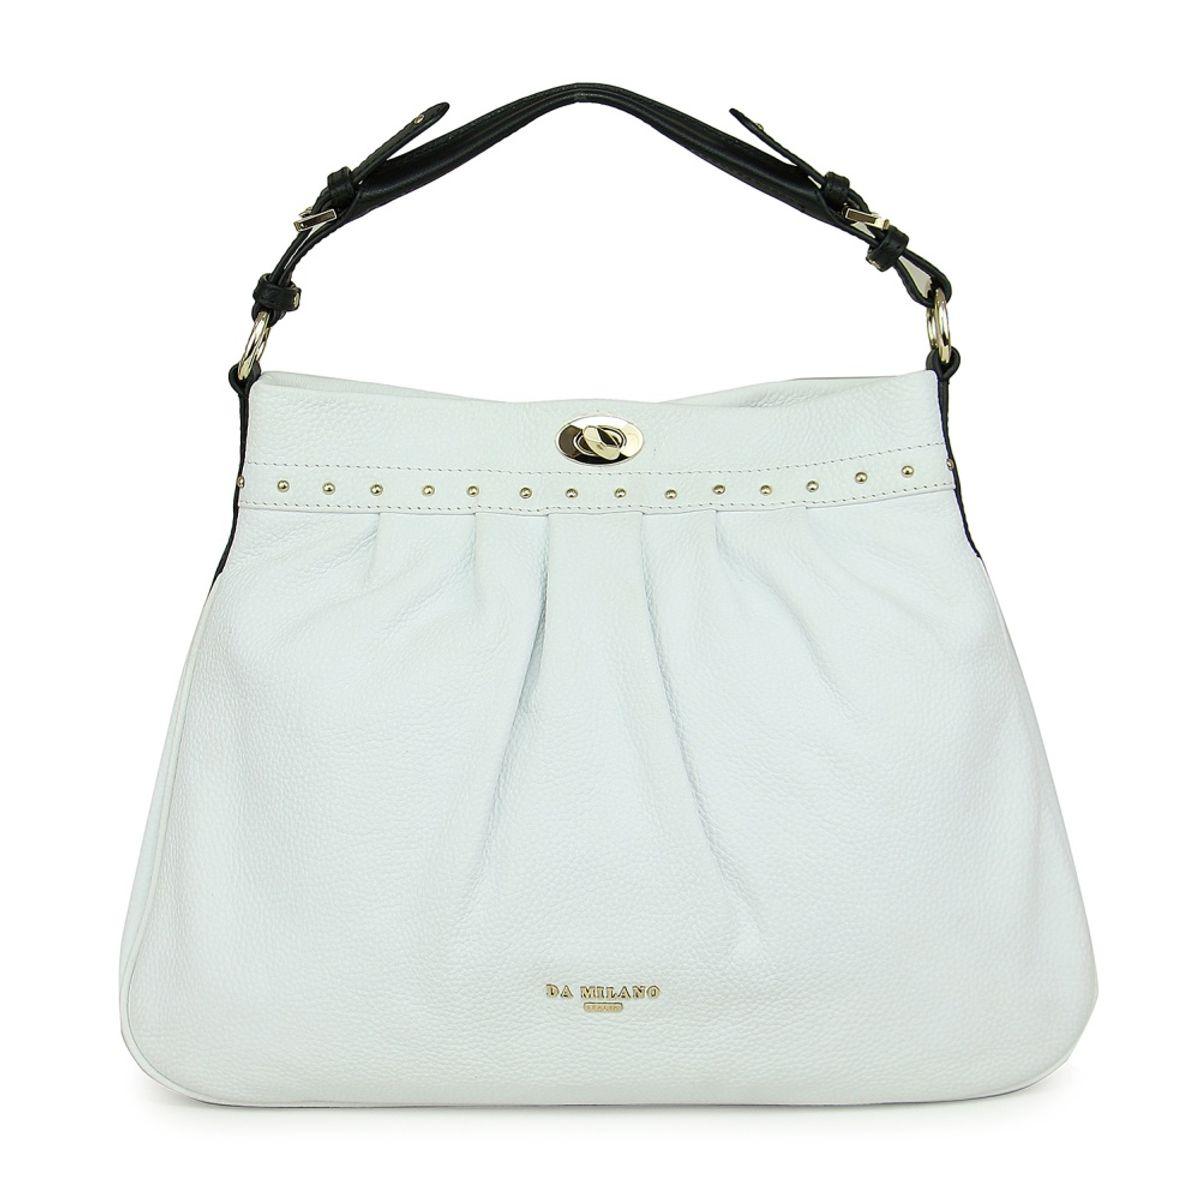 4de4fdc3d White Leather Handbags Ebay - Foto Handbag All Collections ...